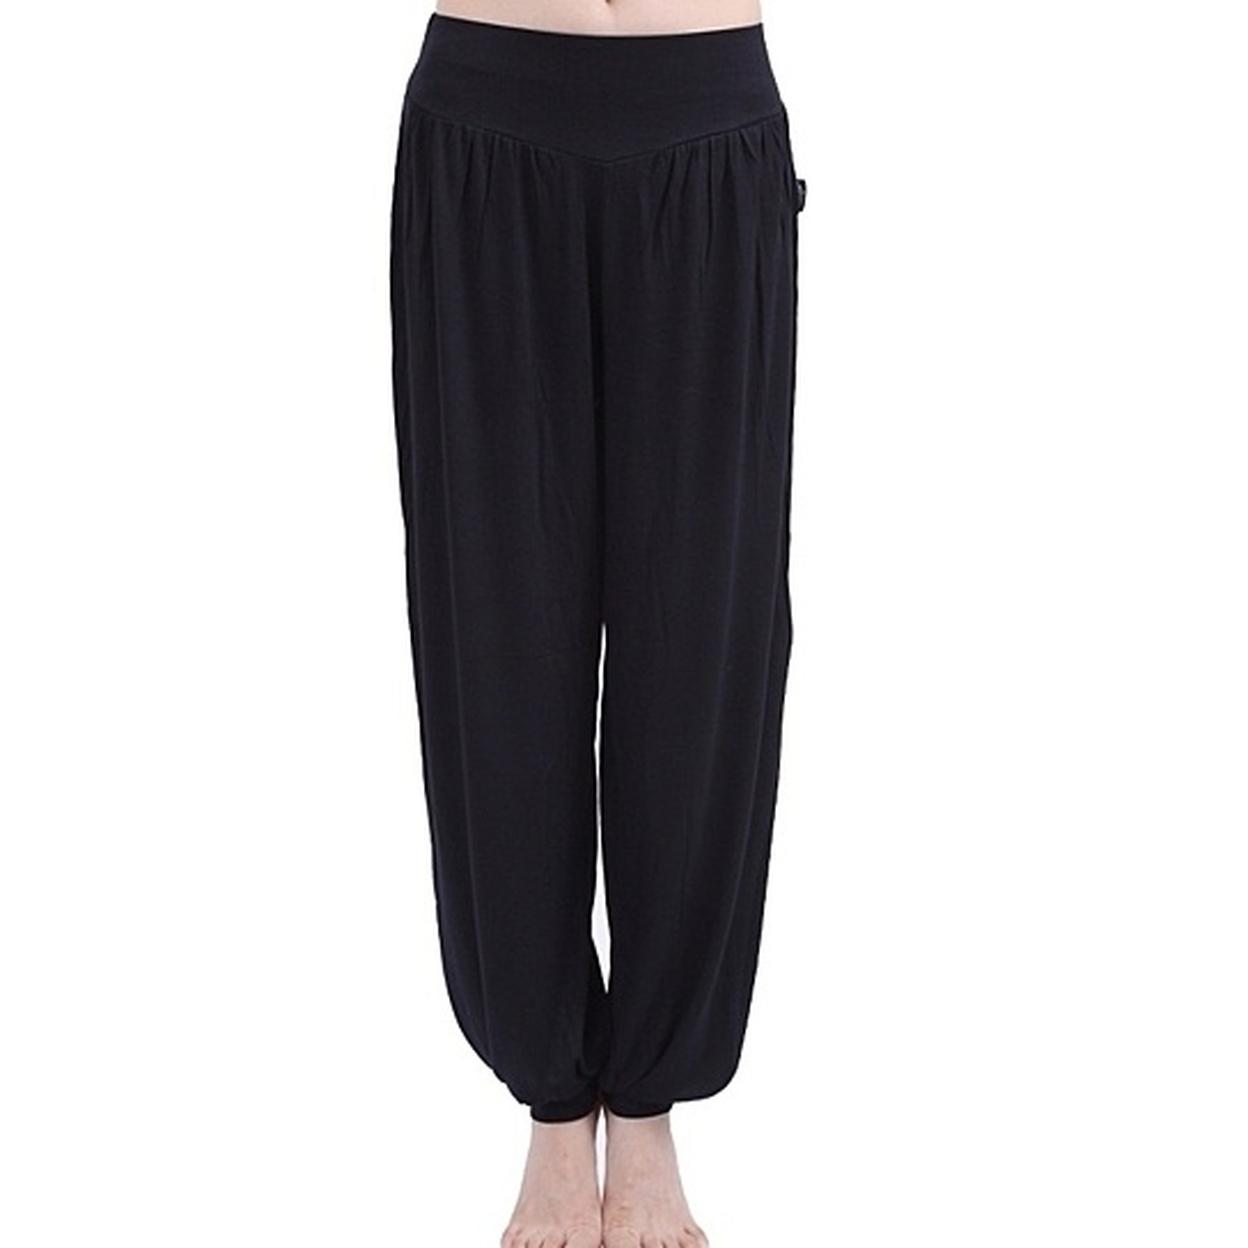 Women Loose Yoga Pants - Black, S 5995c1fc78a3c955f90e4bf6